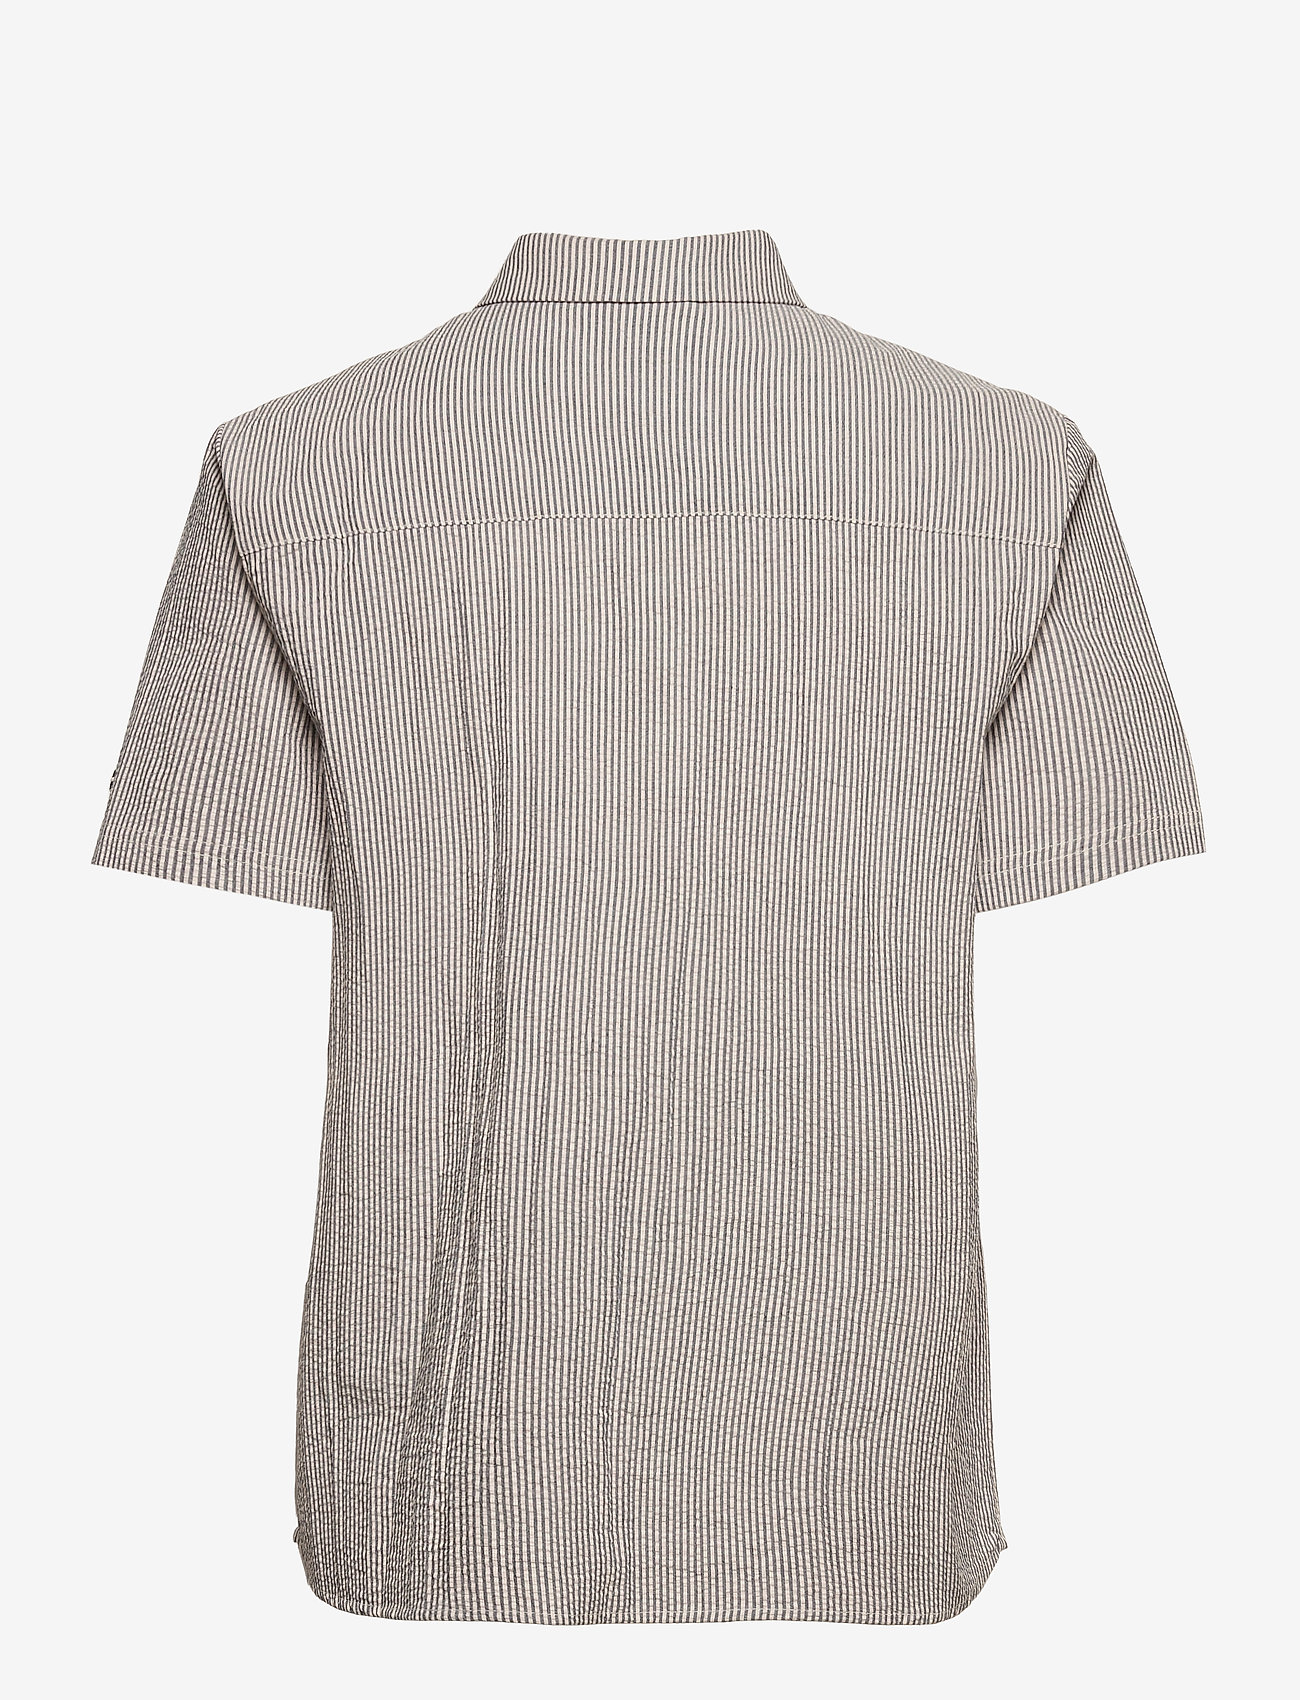 Superdry - STUDIOS SS SHIRT - short-sleeved shirts - navy stripe - 1